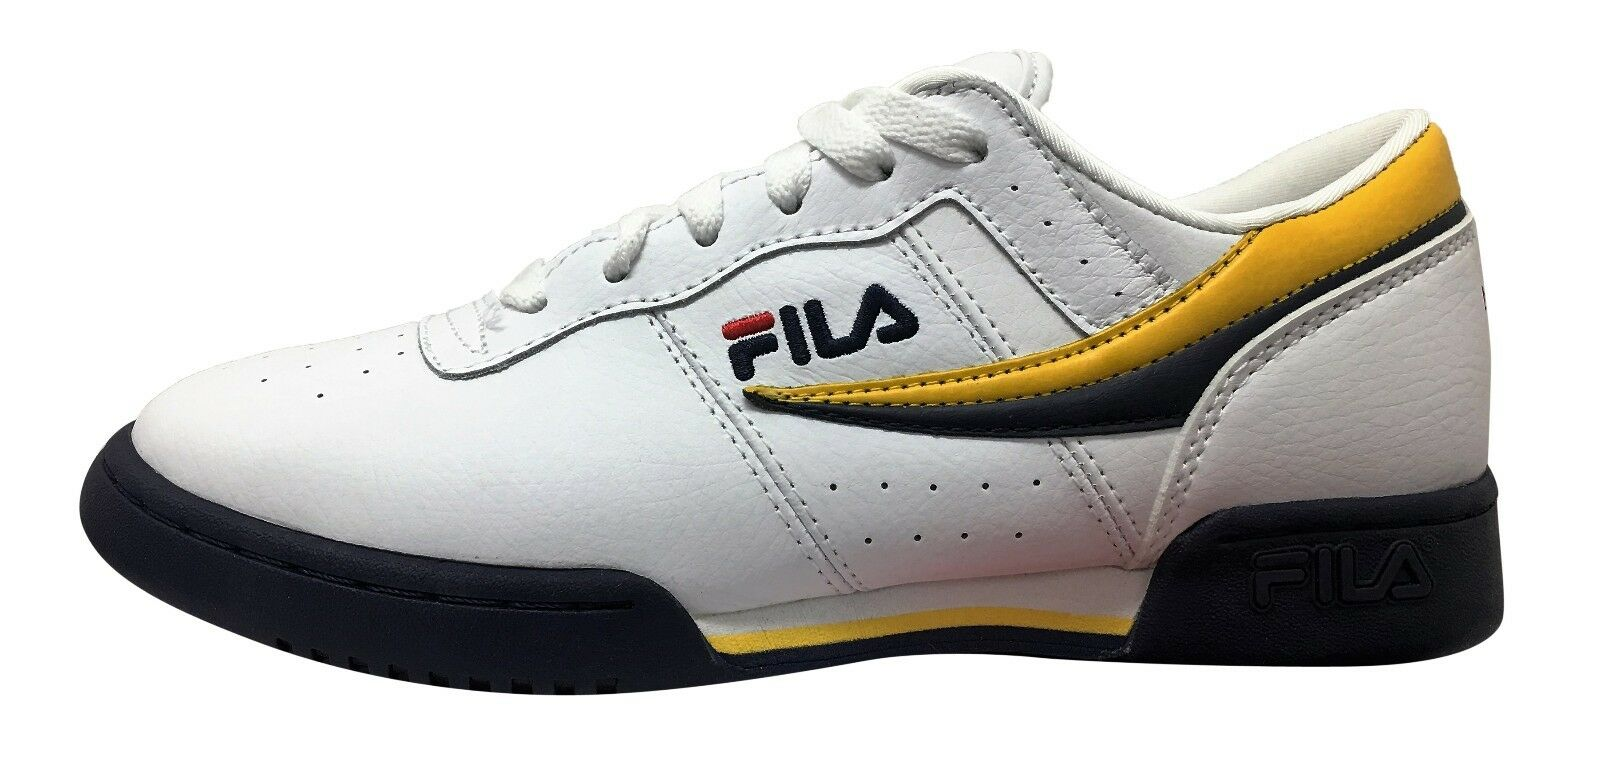 Fila Original Fitness White/Navy/Lemon Price reduction Comfortable and good-looking